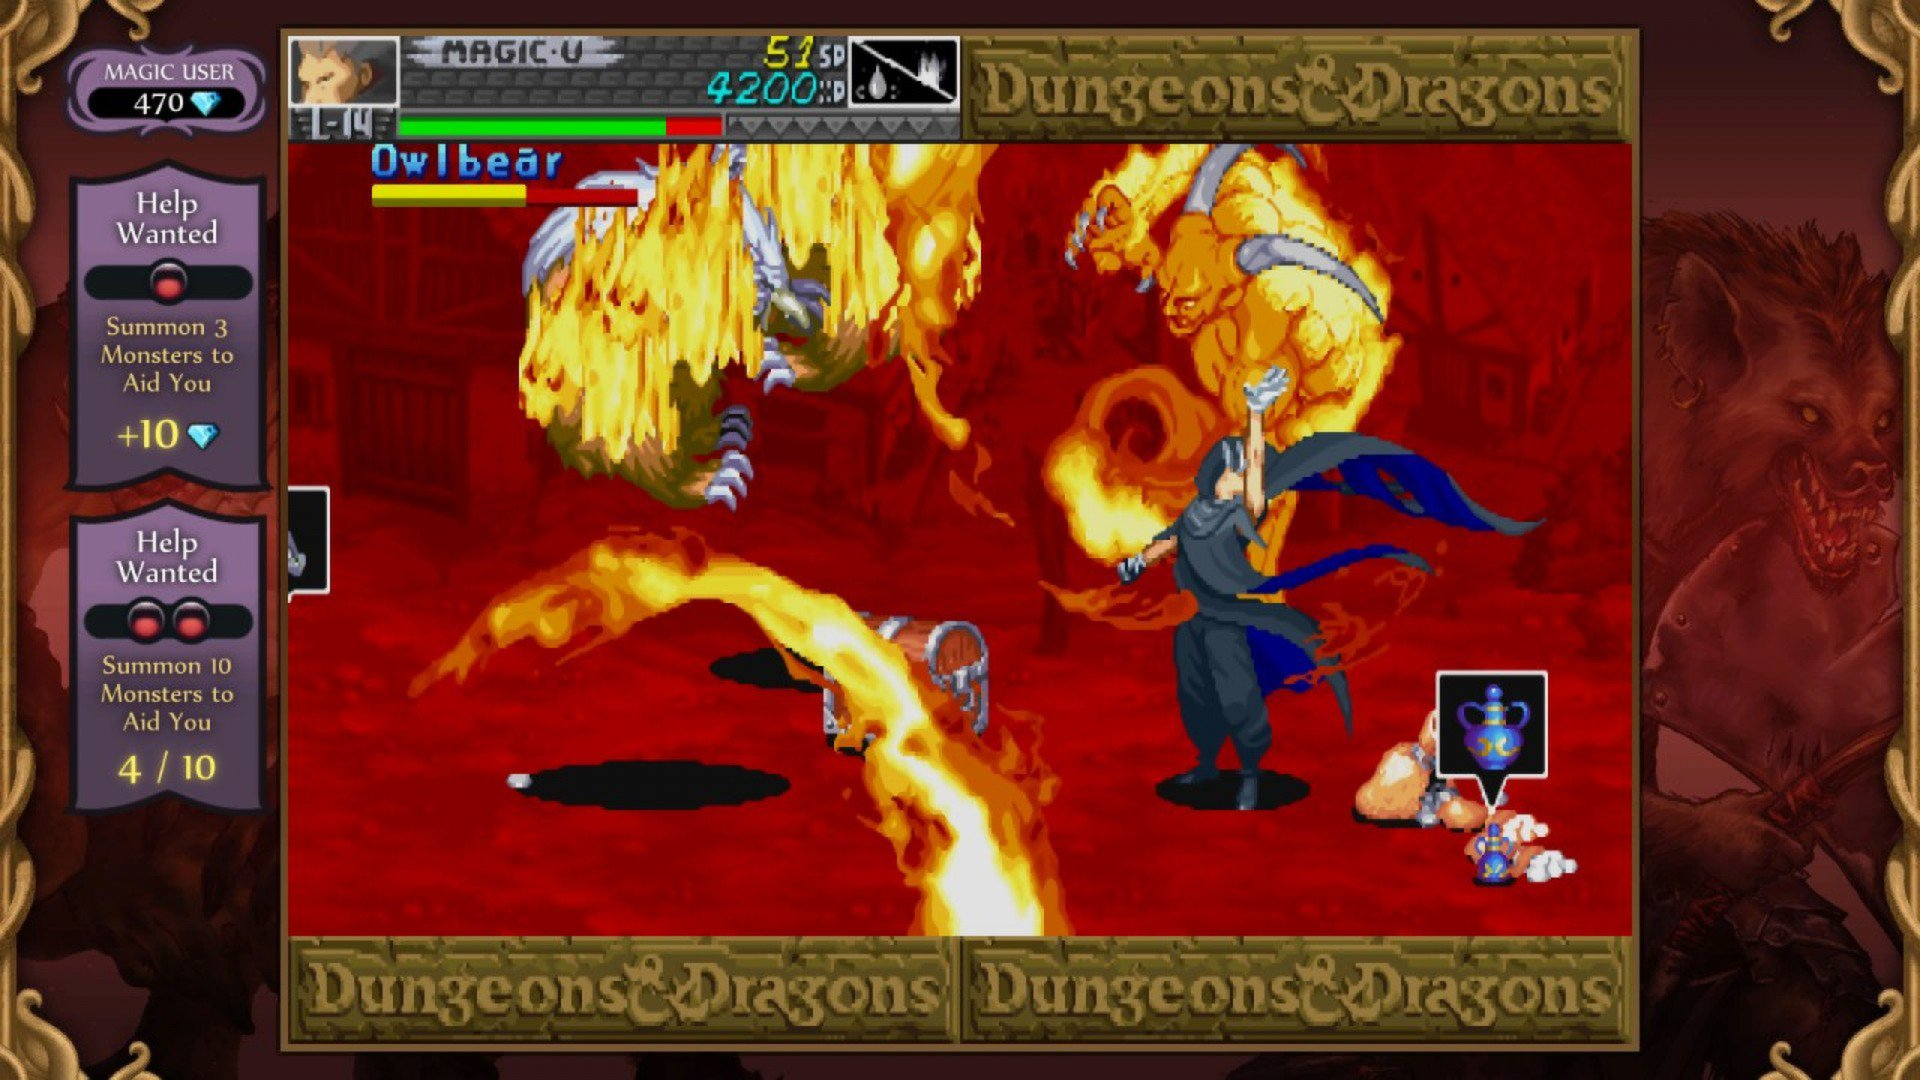 Dungeons & Dragons Chronicles of Mystara 6